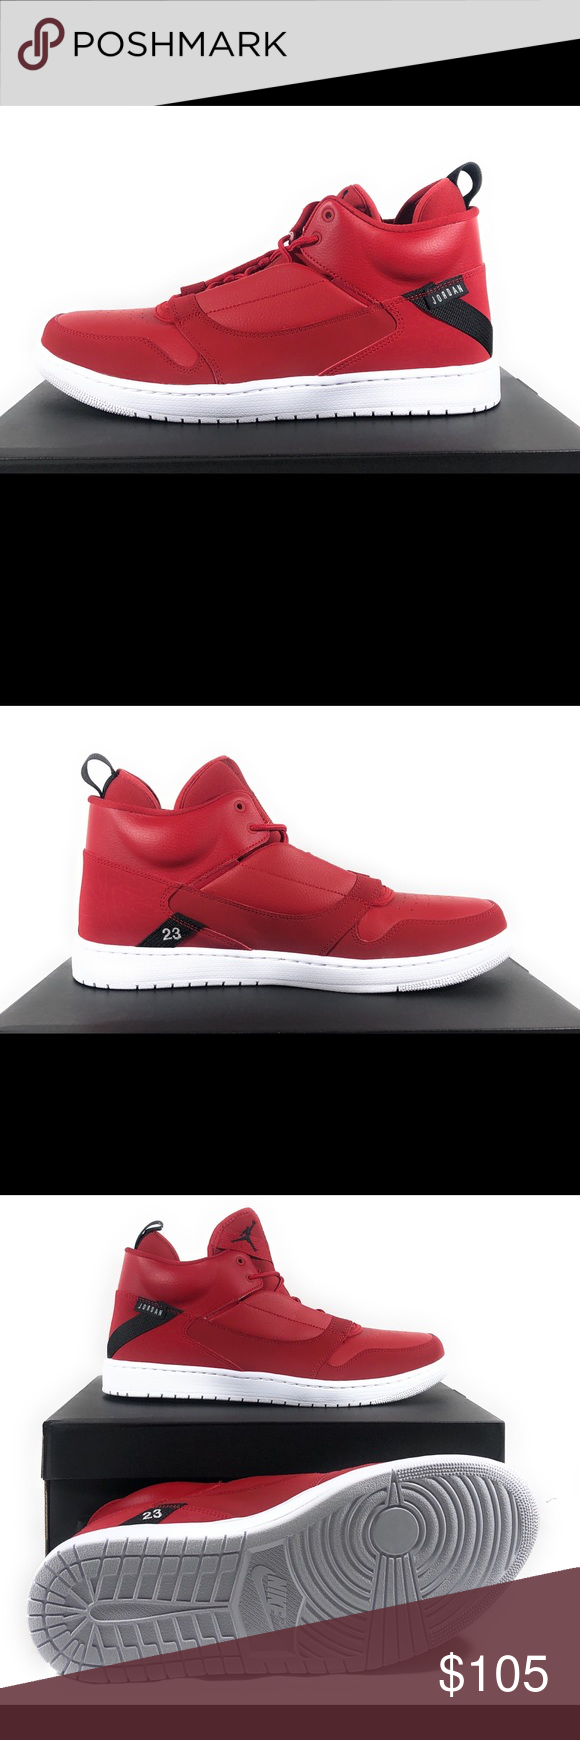 642cbb033c3f Nike Jordan Fadeaway Men s Basketball Sneakers Nike Jordan Fadeaway Men s  Mid Top Red Basketball Sneakers AO1329-600 Size  11.5 Condition  NWB  Measurement  ...